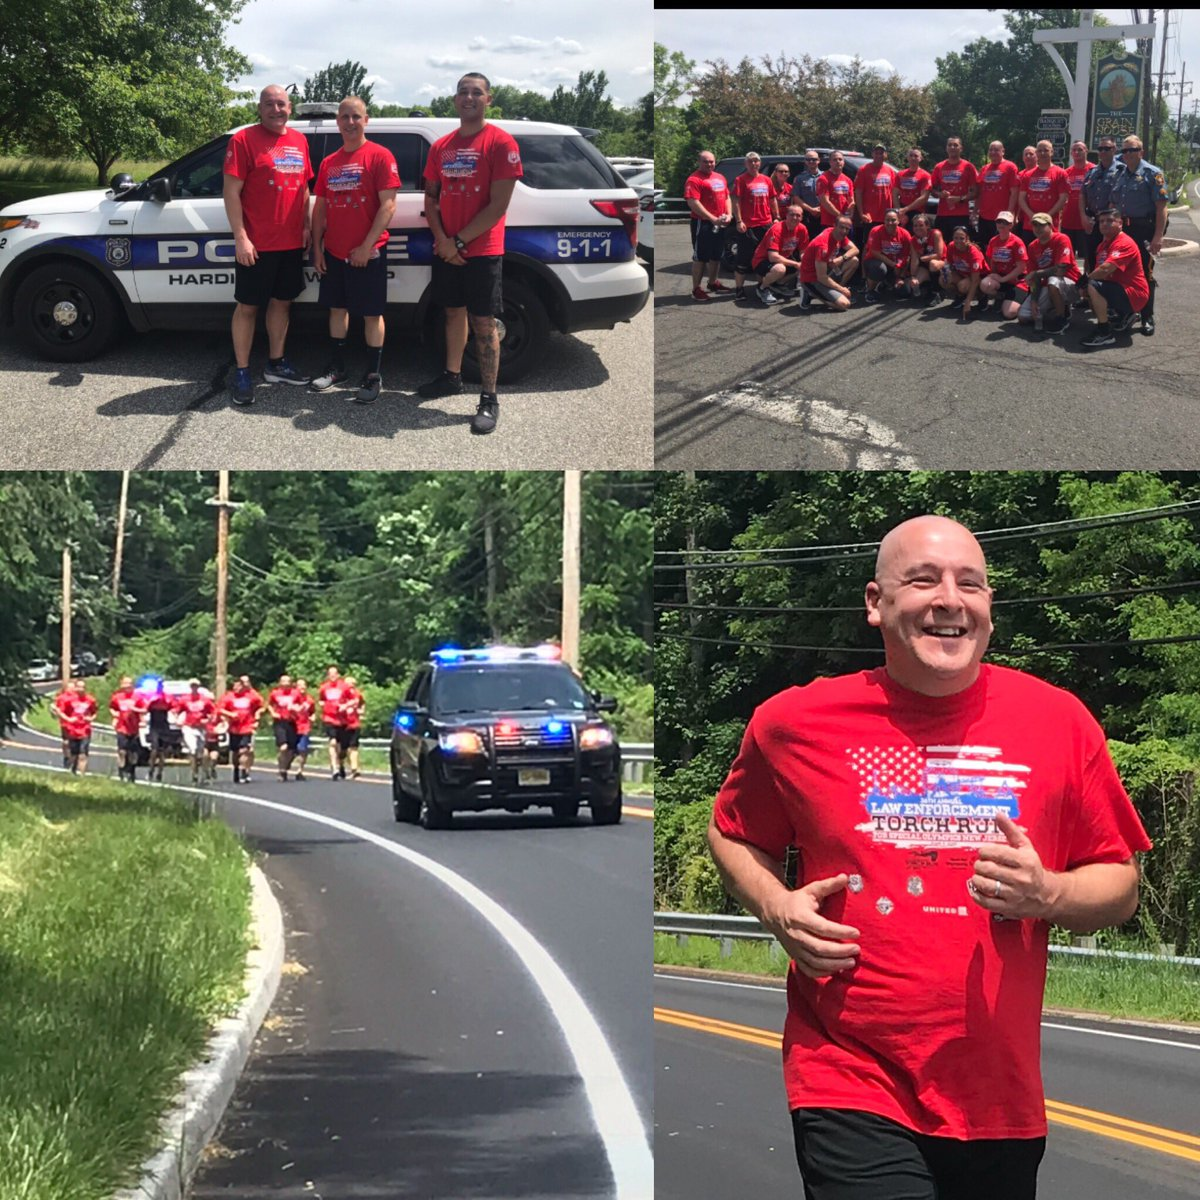 Harding Township Police (@harding_pd) | Twitter